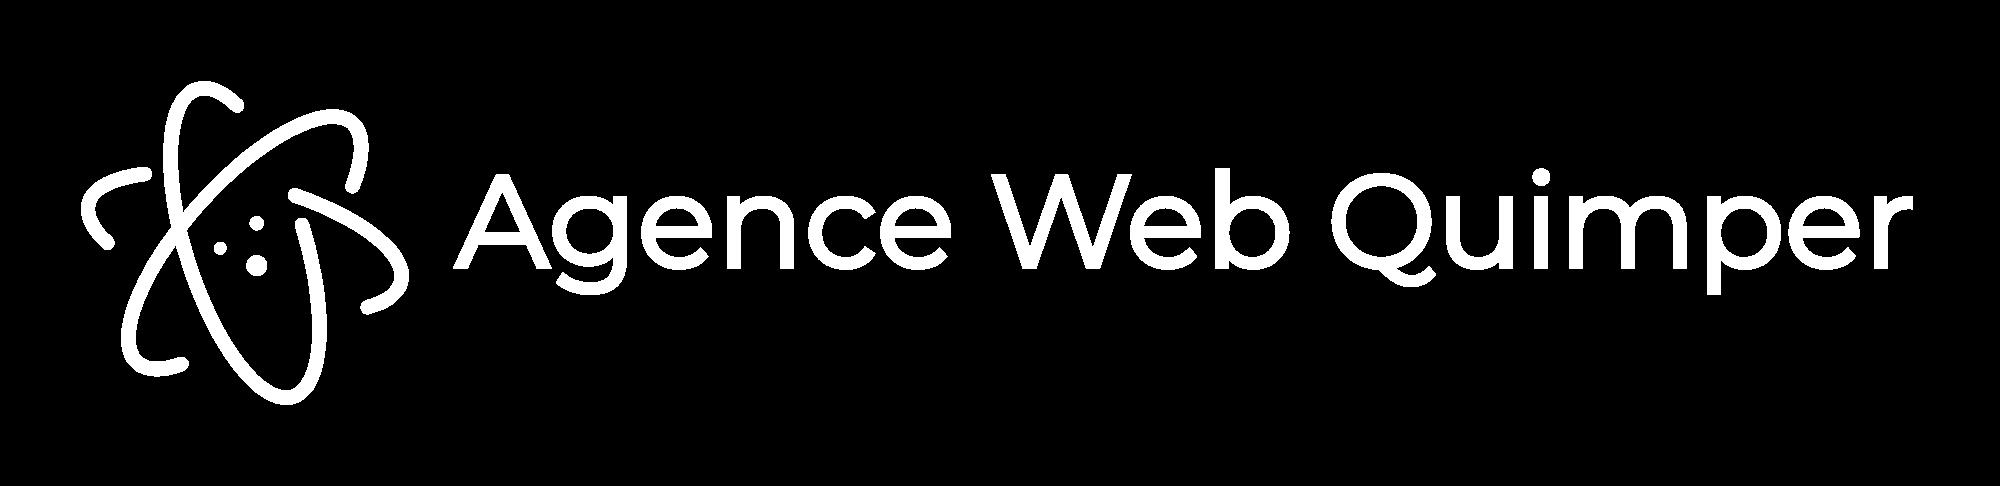 agence web quimper logo blanc